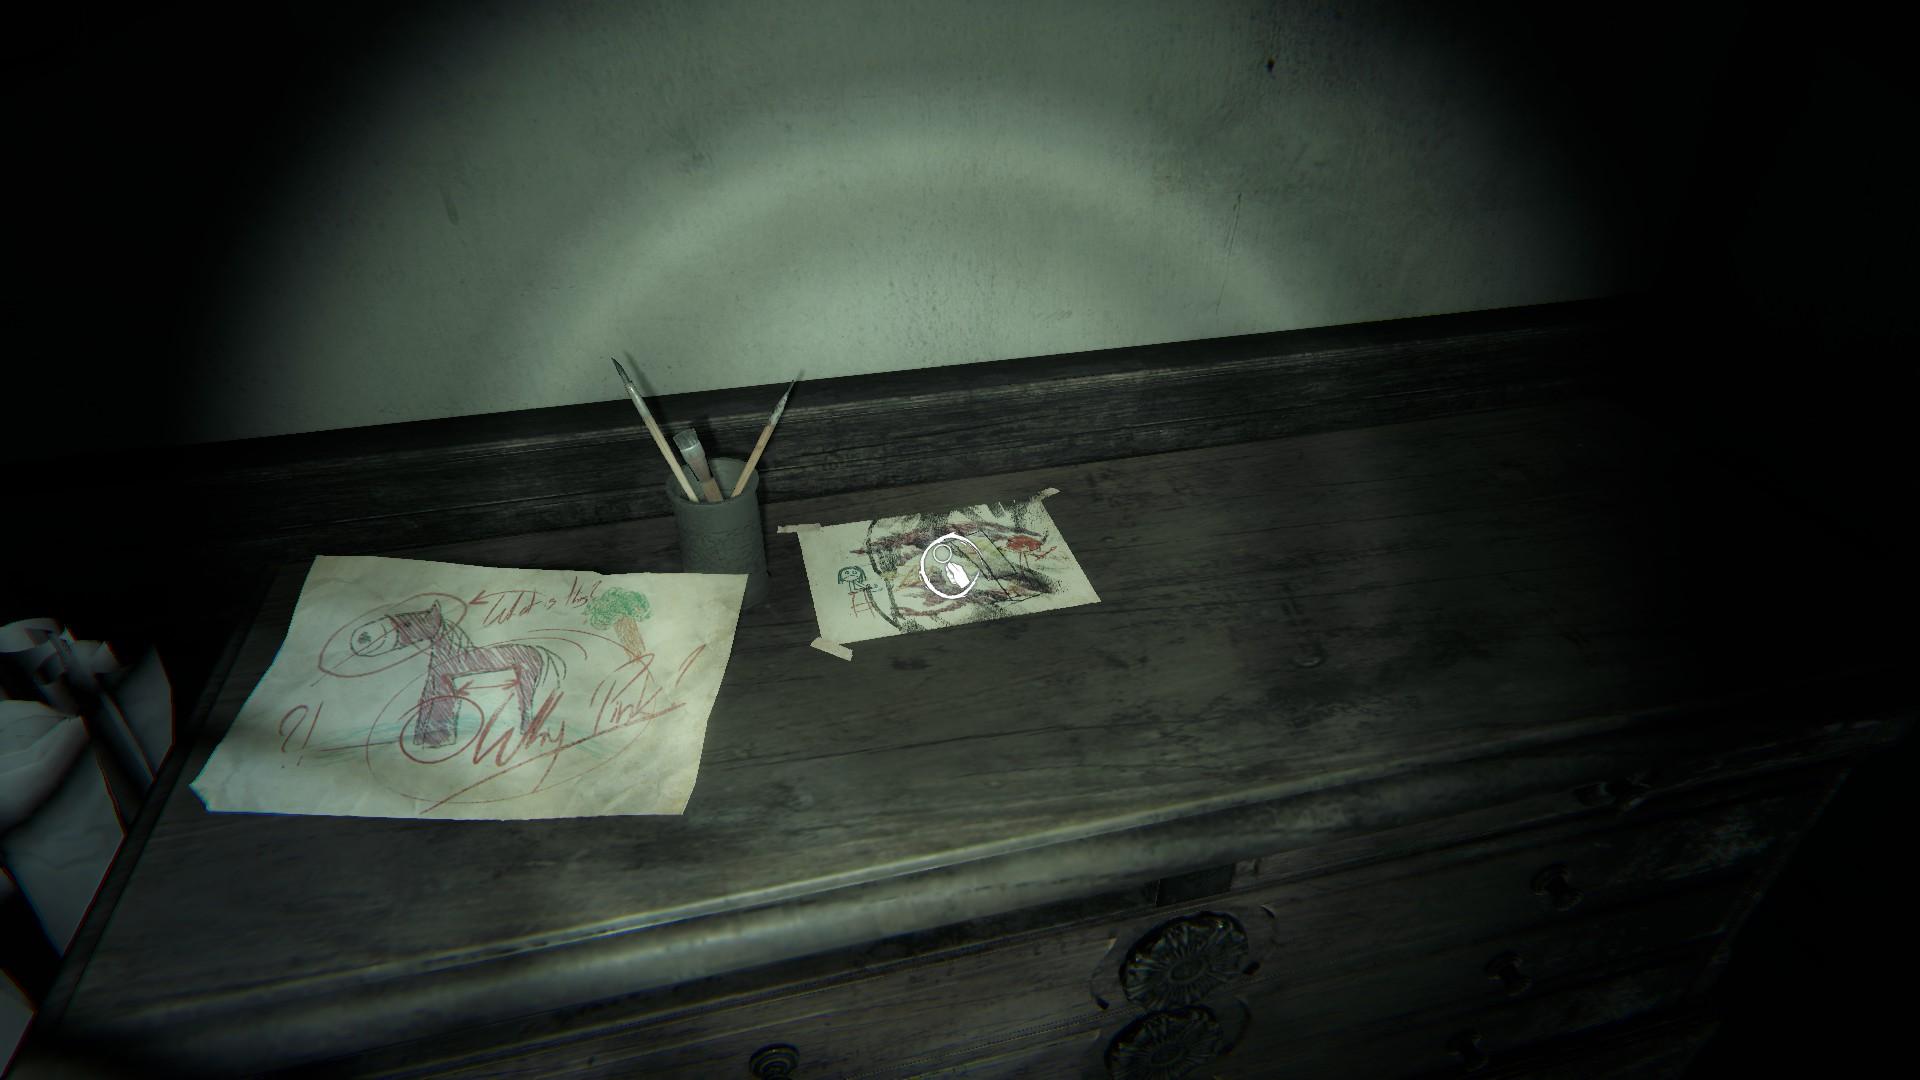 рисунок на камоде